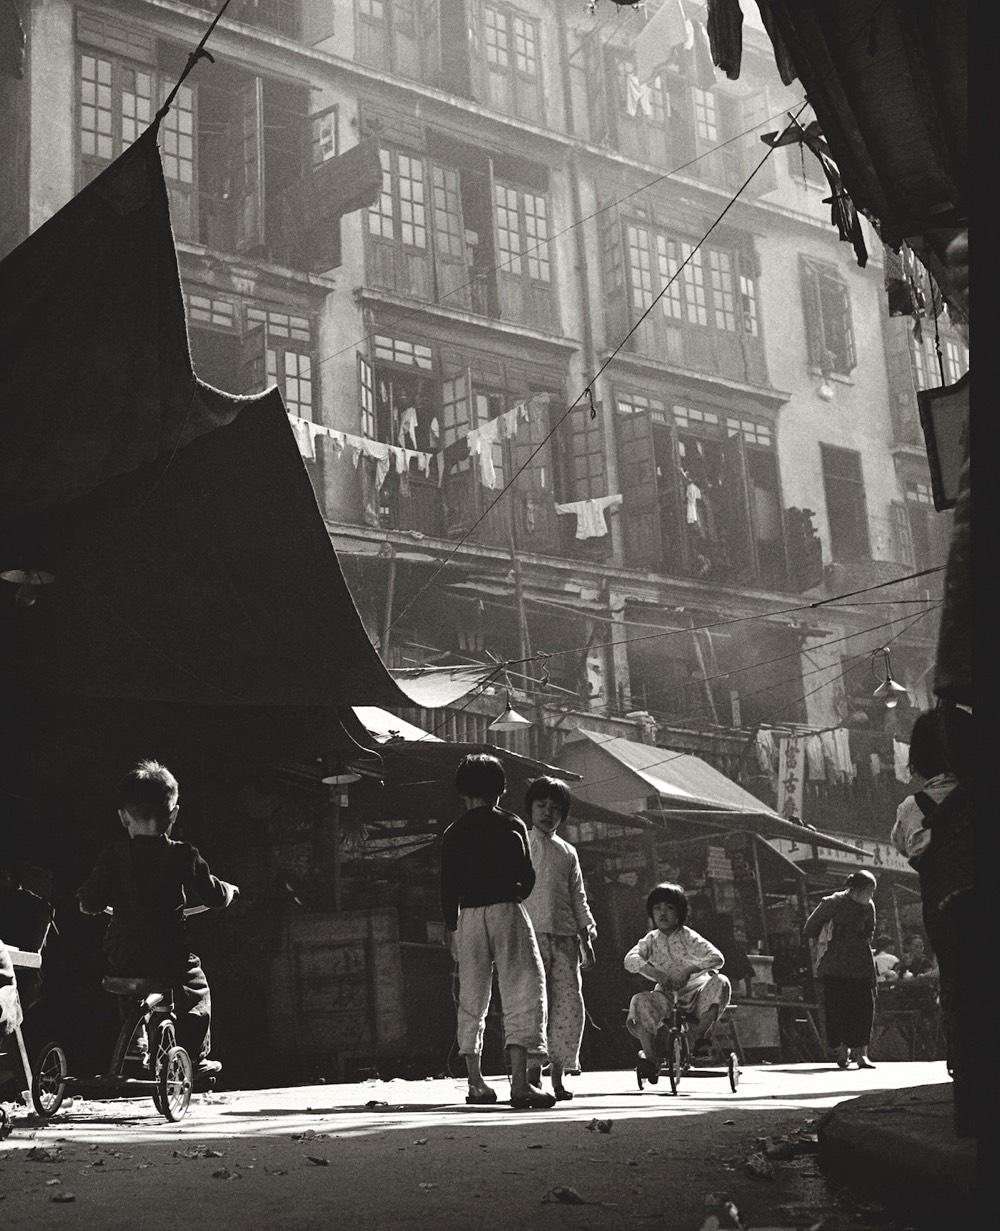 Fan hos street photography of 50s 60s hong kong